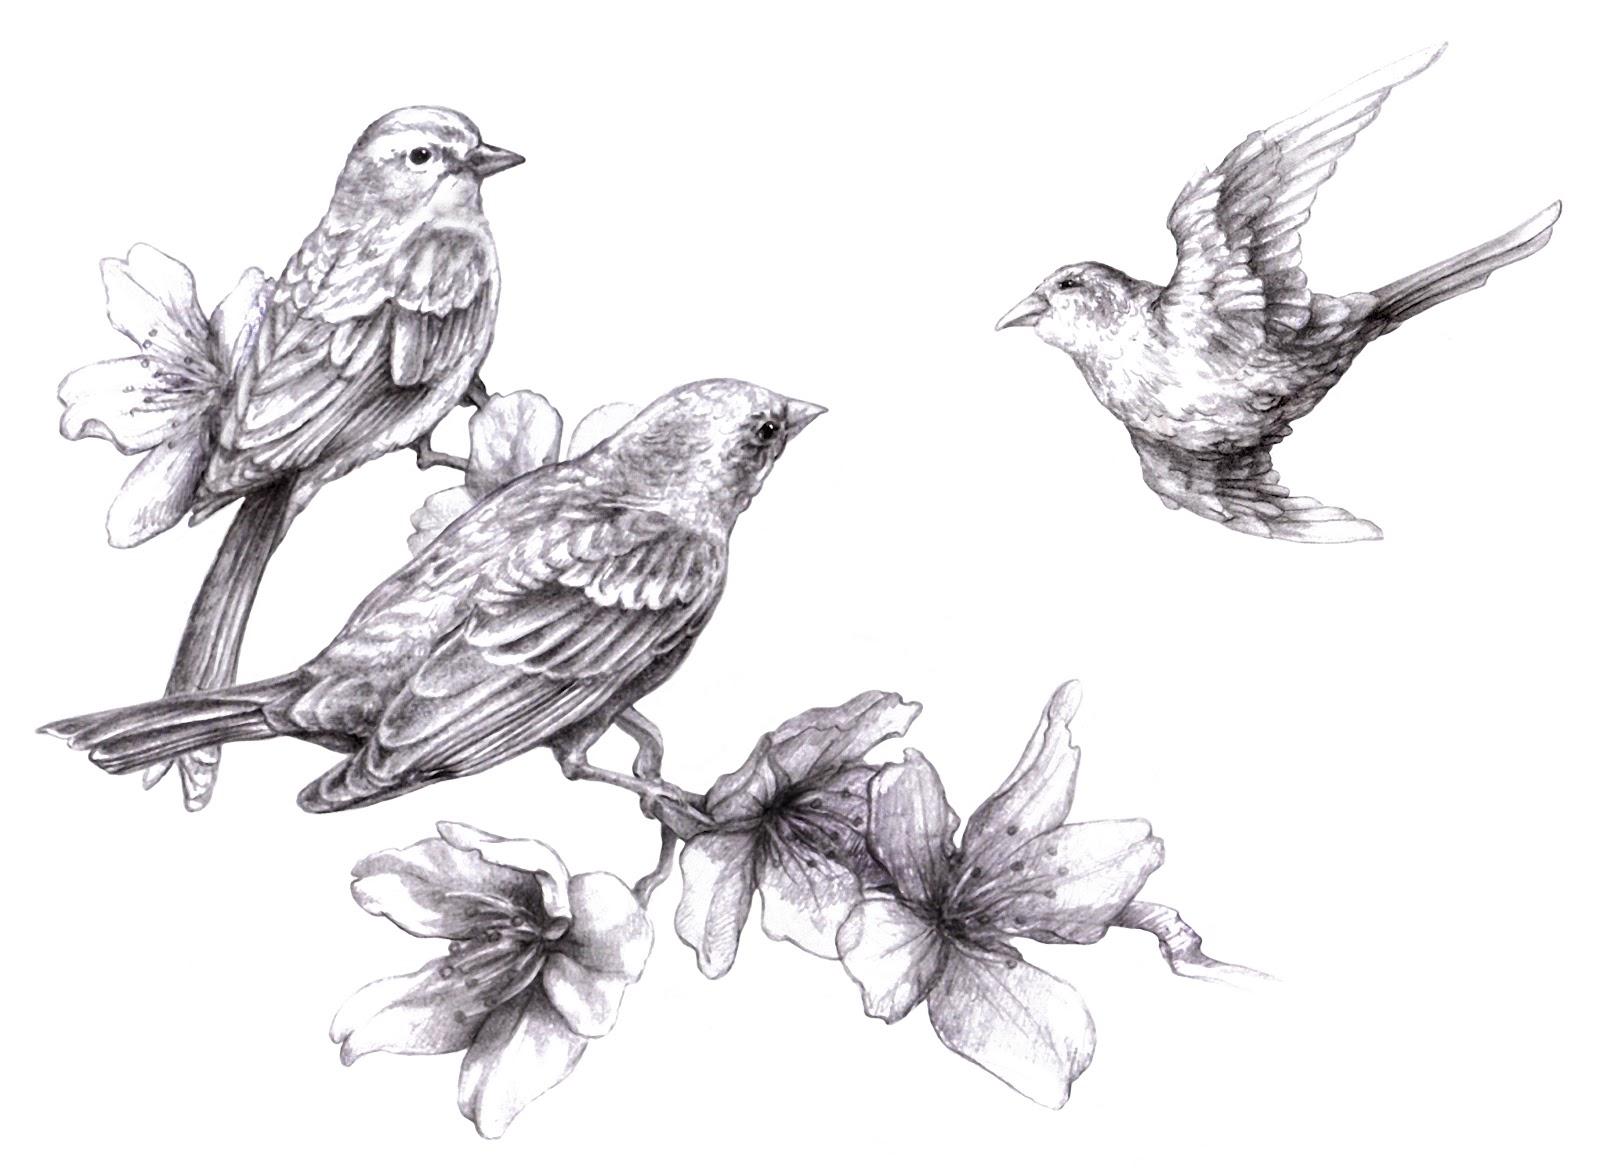 Drawn sakura blossom sparrows Cherry Magellin added new have